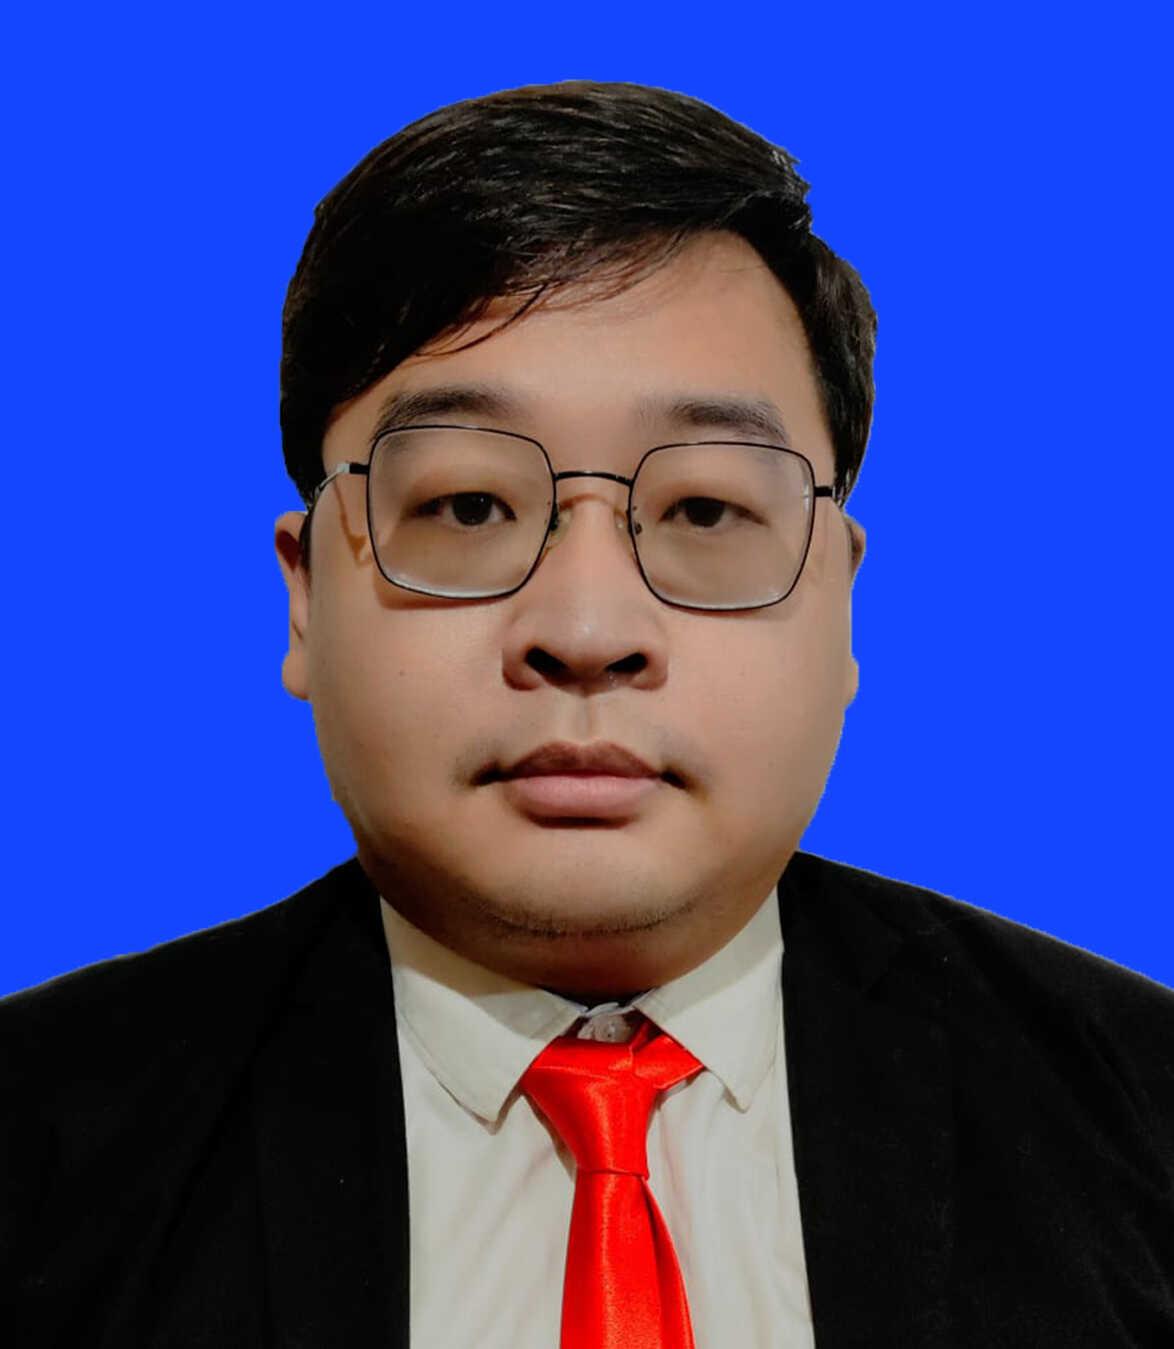 han-johannes_optimized (1)